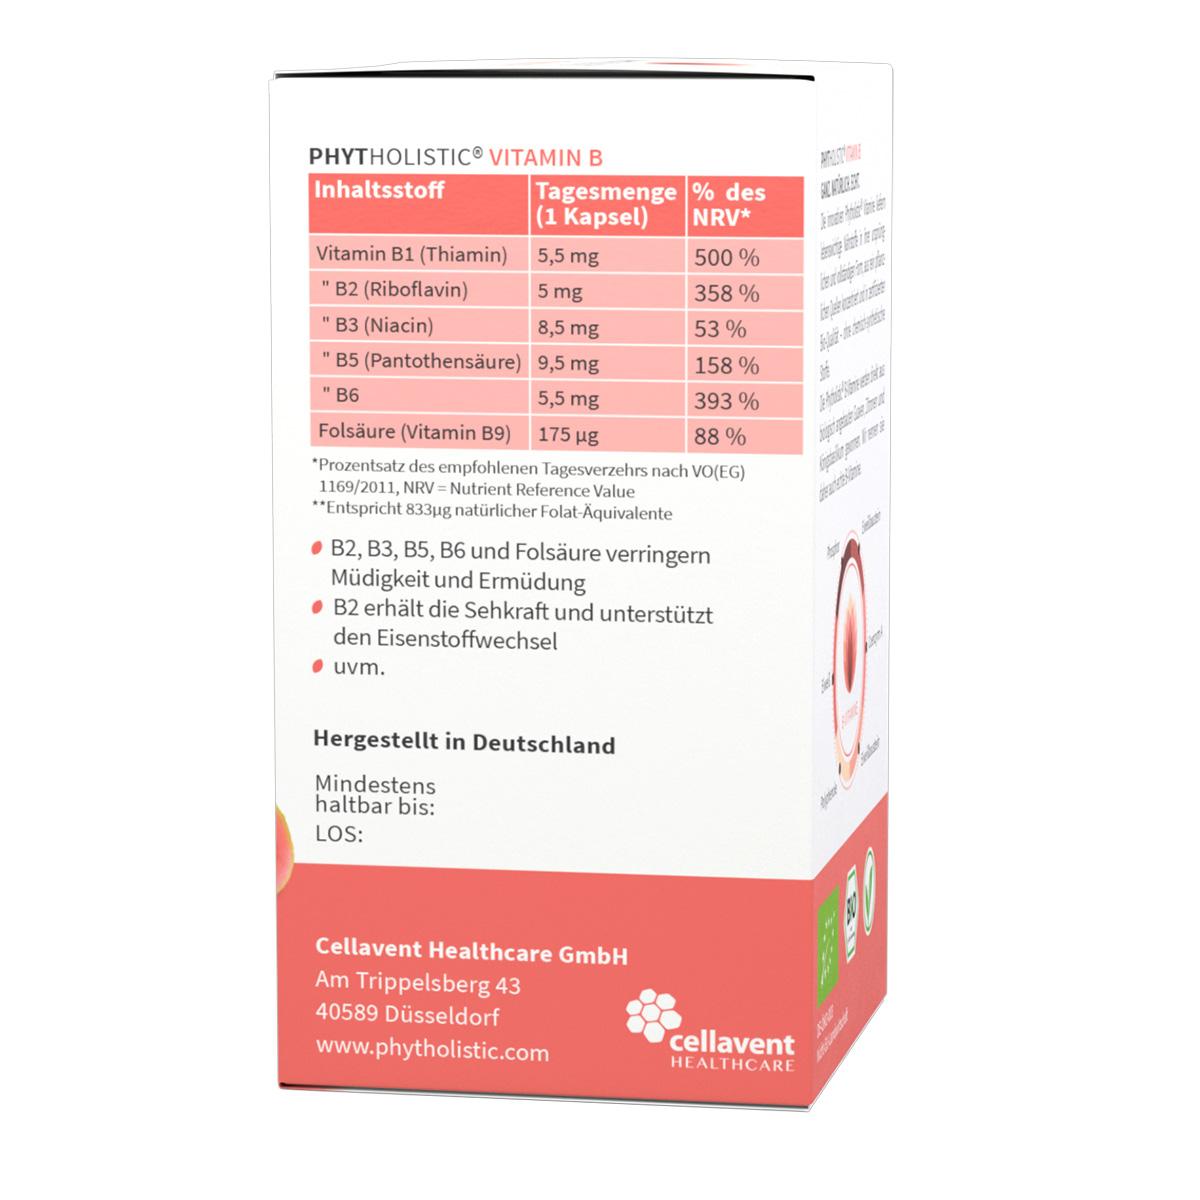 vitamin-b-kapseln-bio-rein-pflanzlich-phytholistic-90-stueck-verpackung-rechts-1200x1200